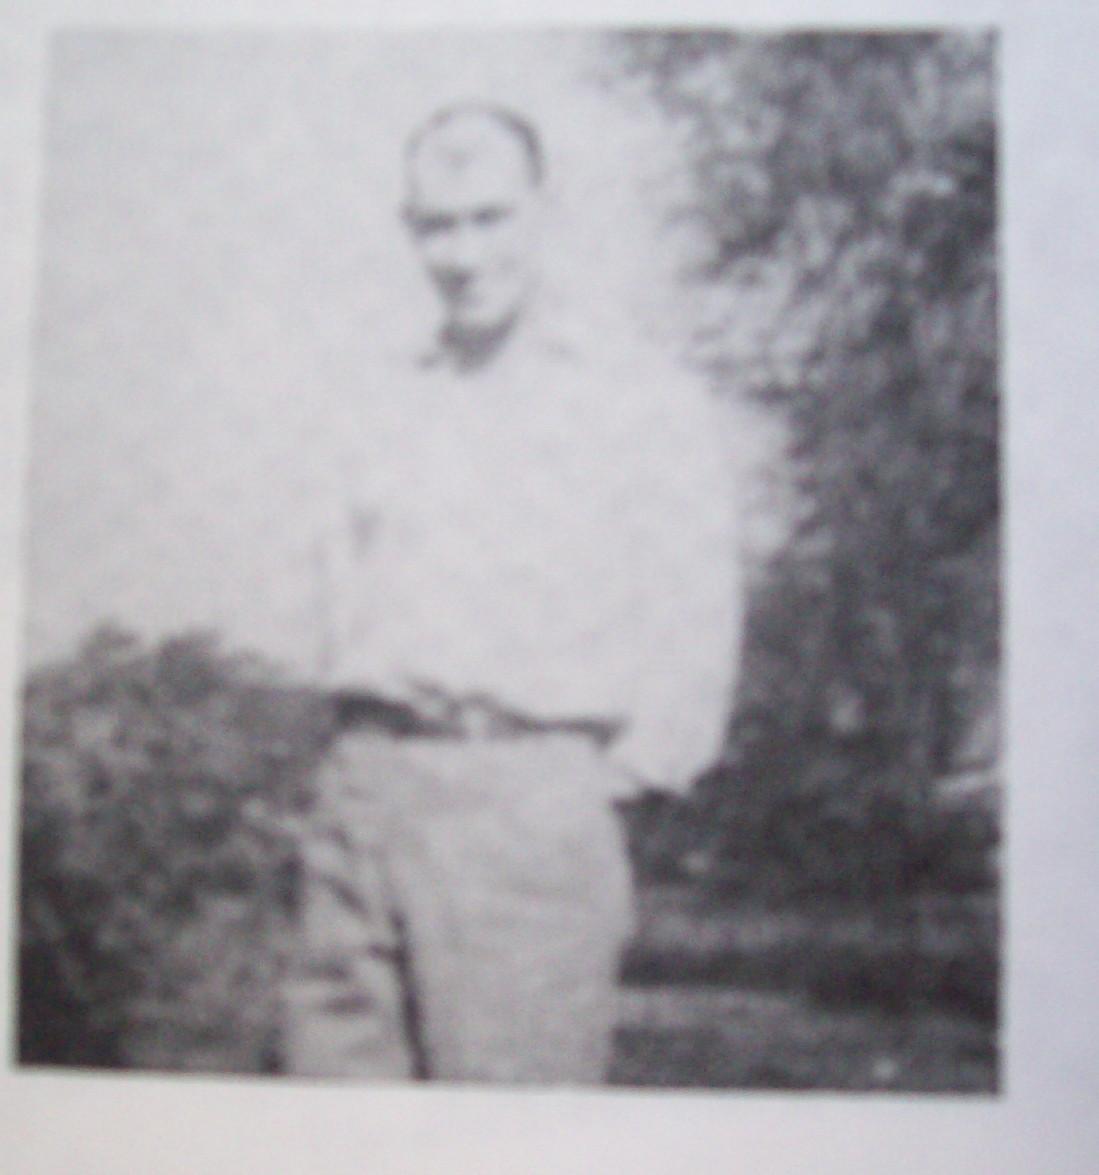 William Richard Bill Mecham